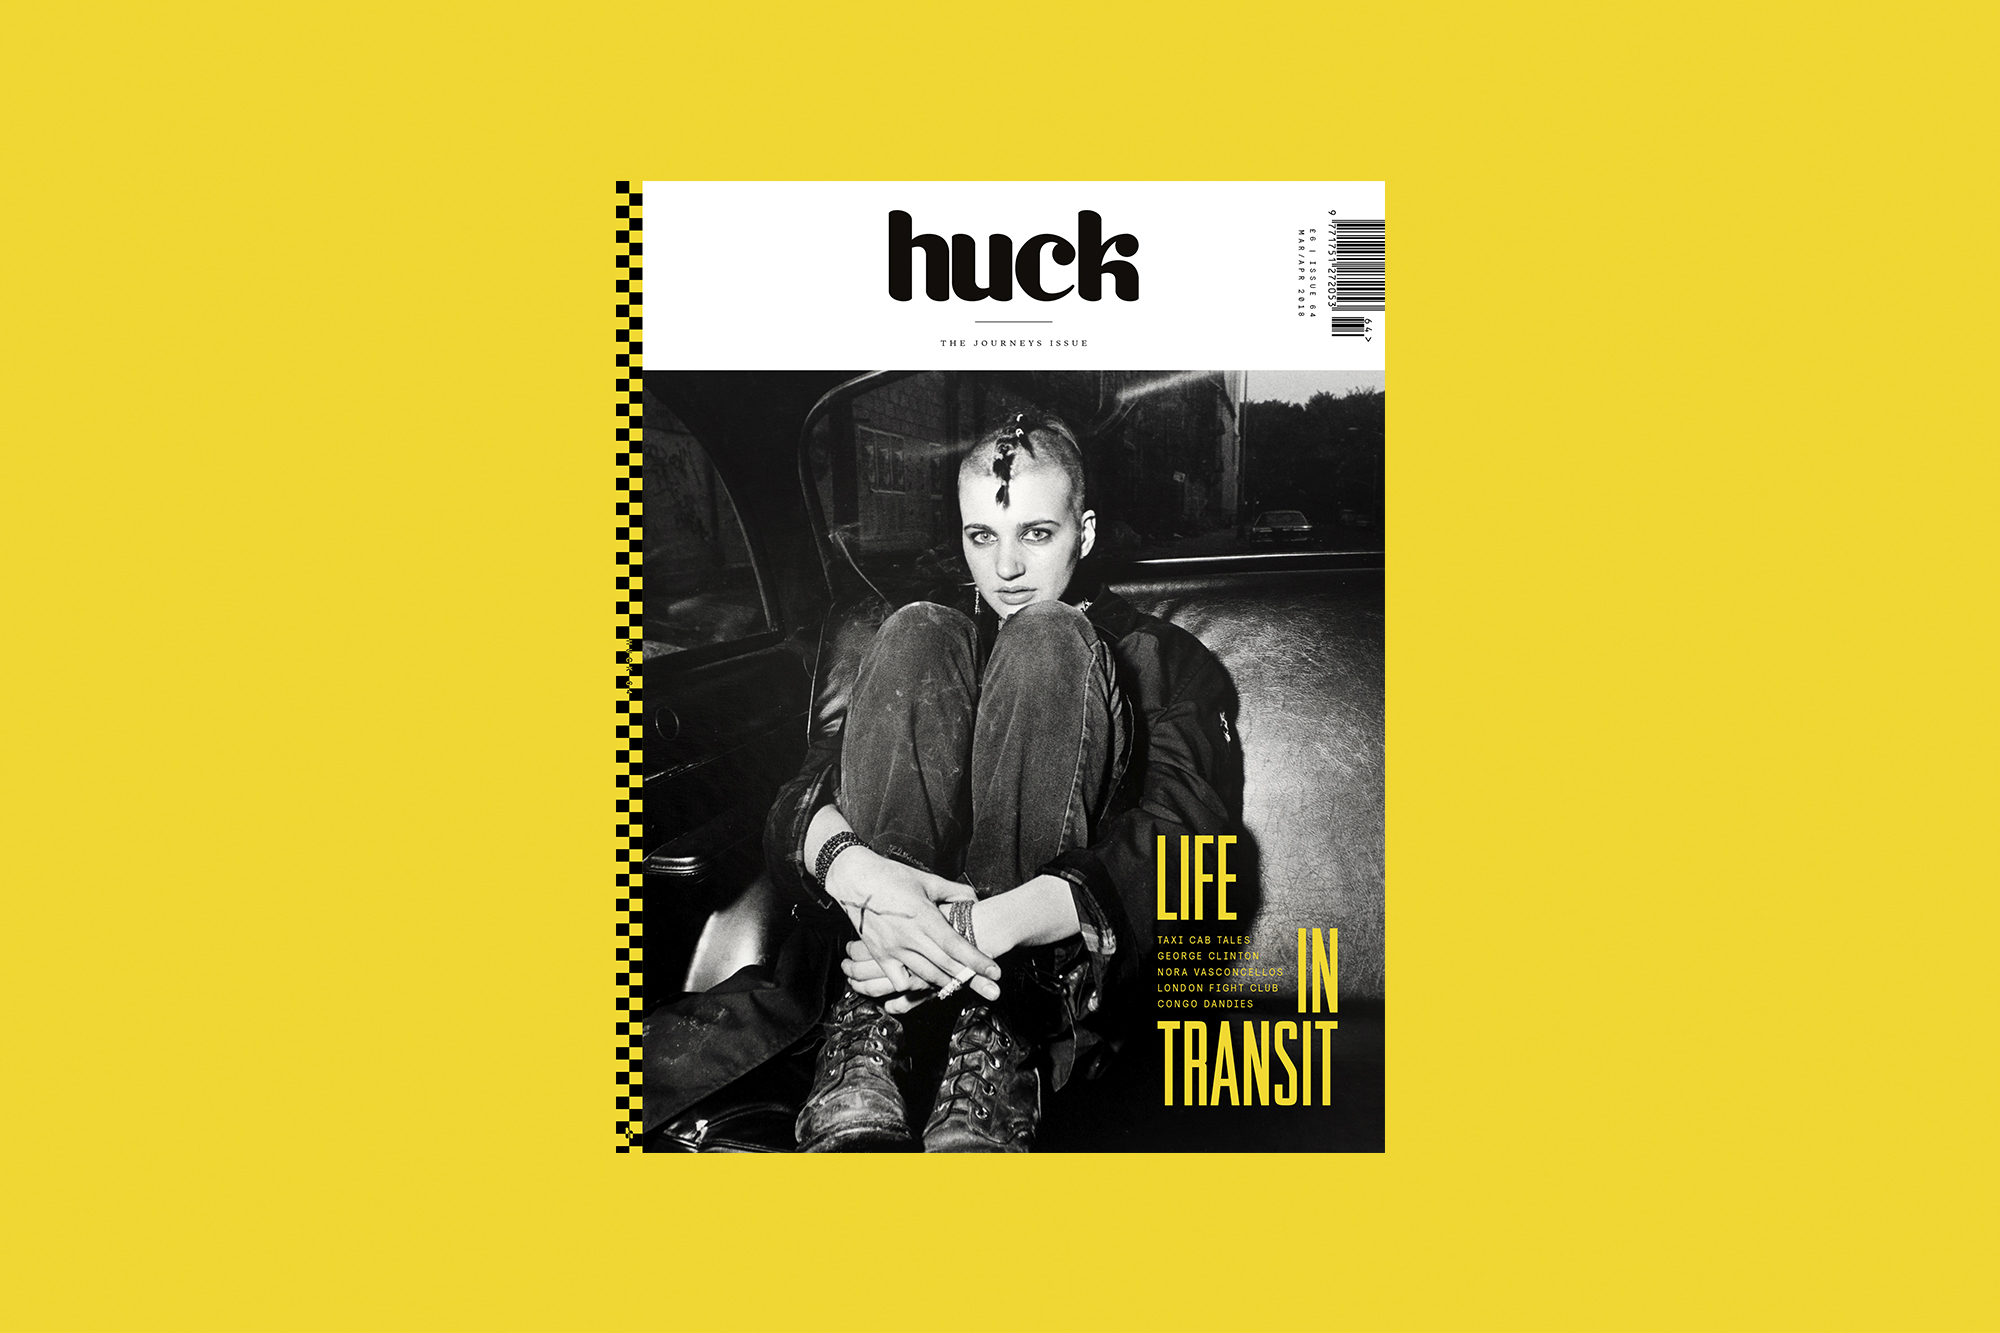 huck journeys cover_2.jpg